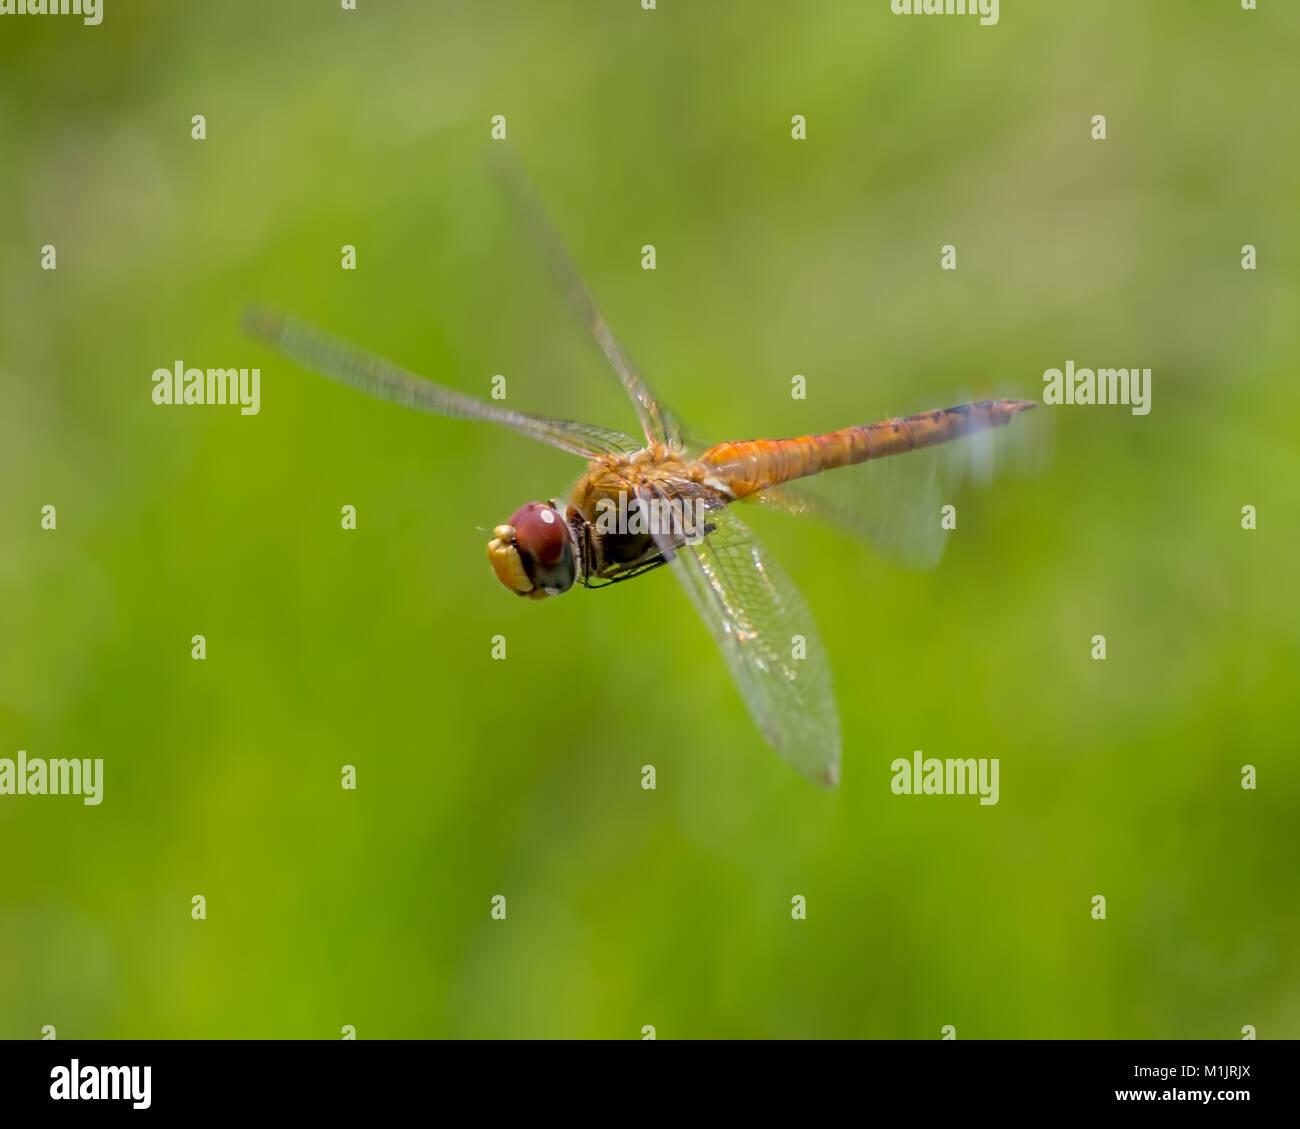 Wandering glider dragonfly in flight - Stock Image